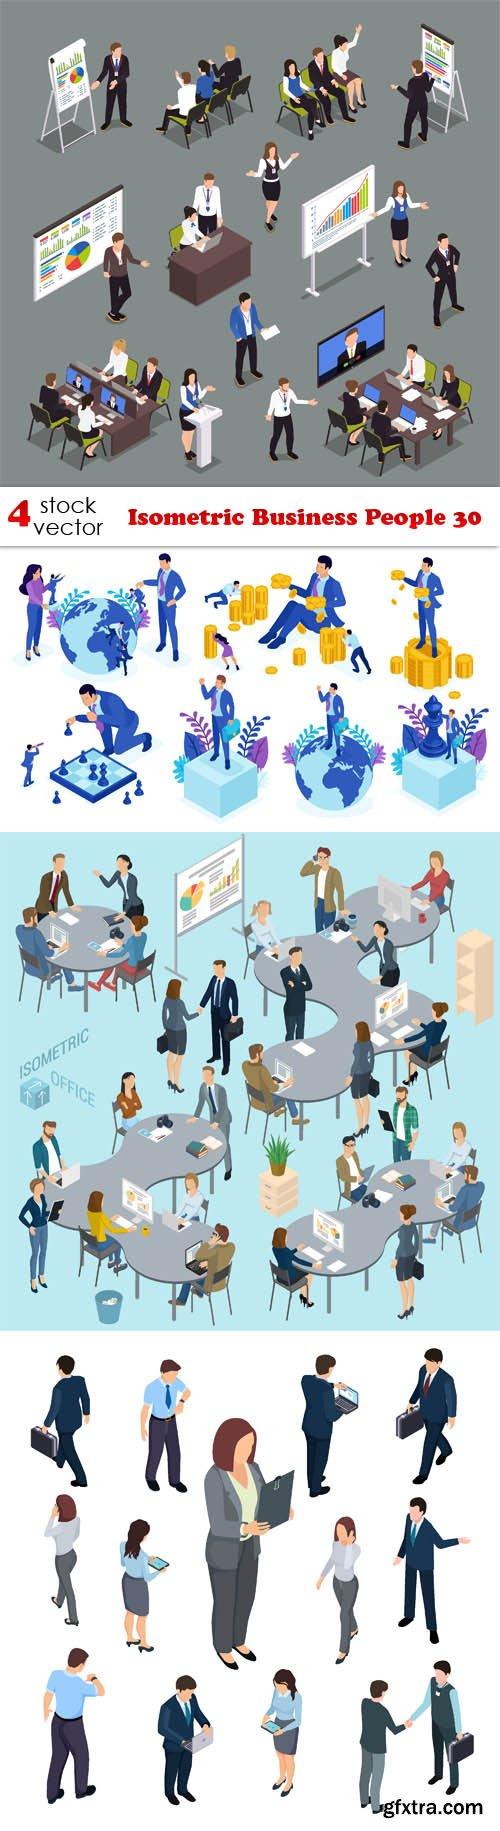 Vectors - Isometric Business People 30